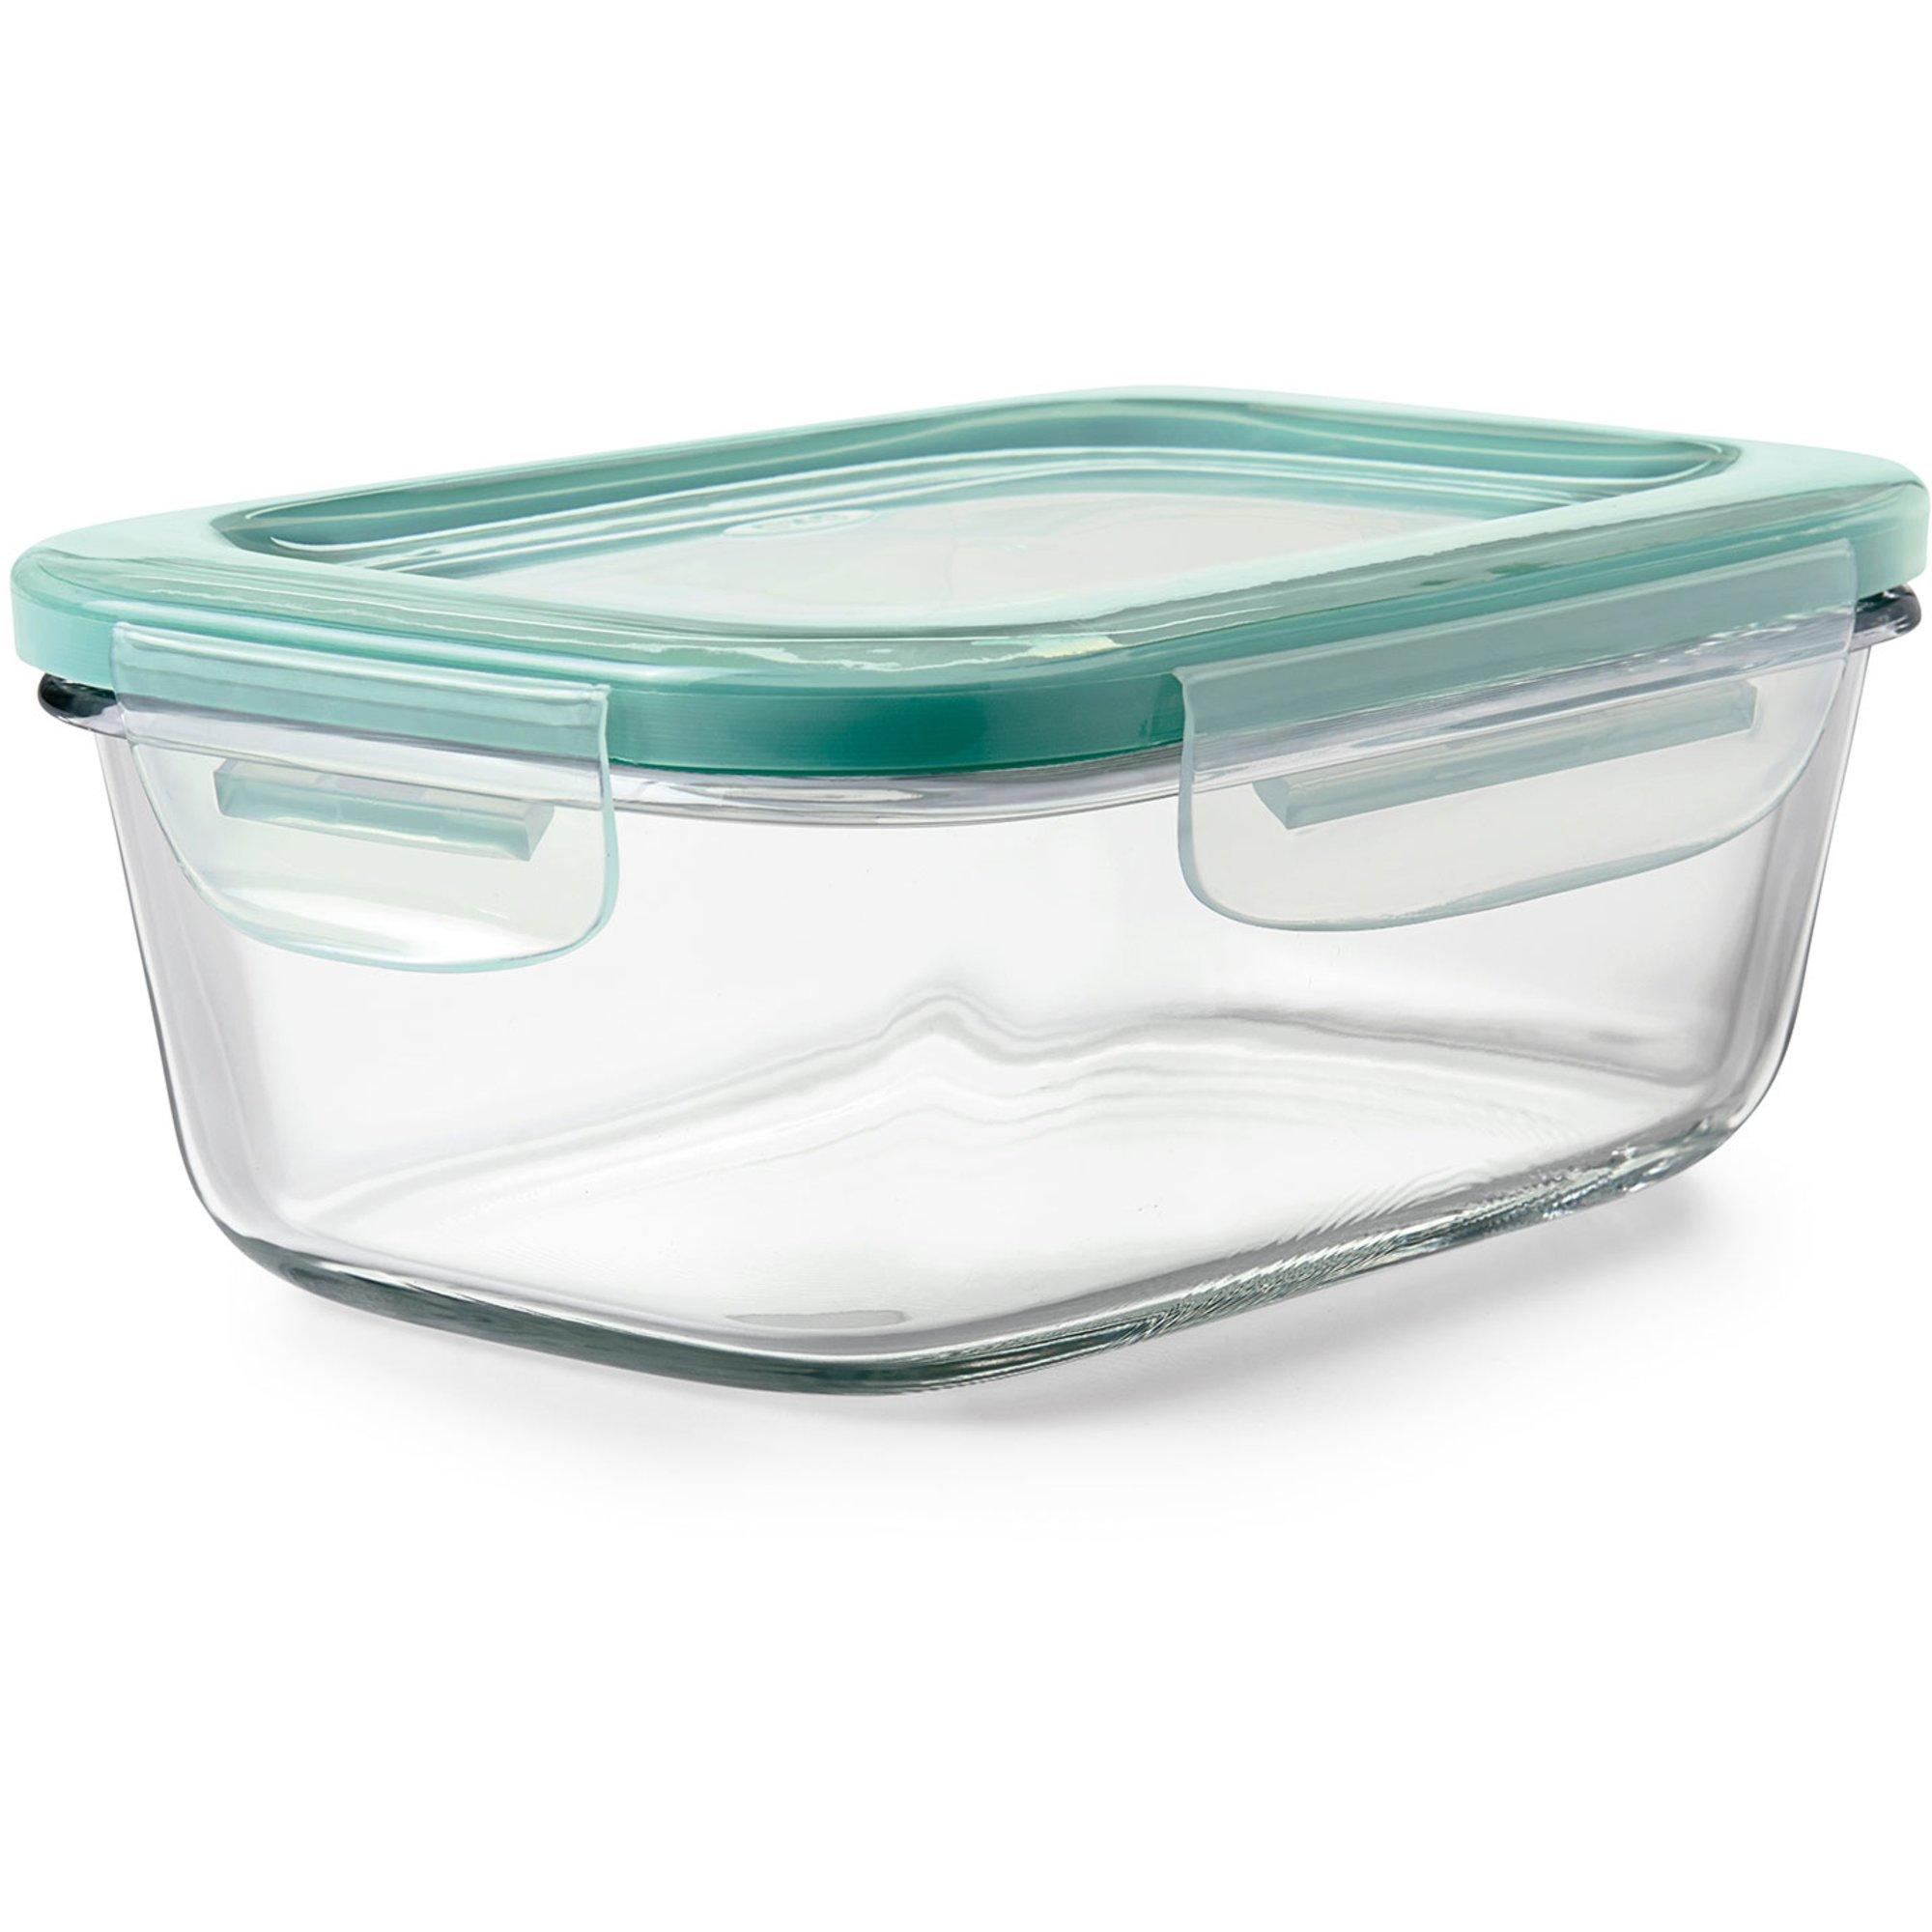 OXO Matlåda glas rektangulär 840 ml